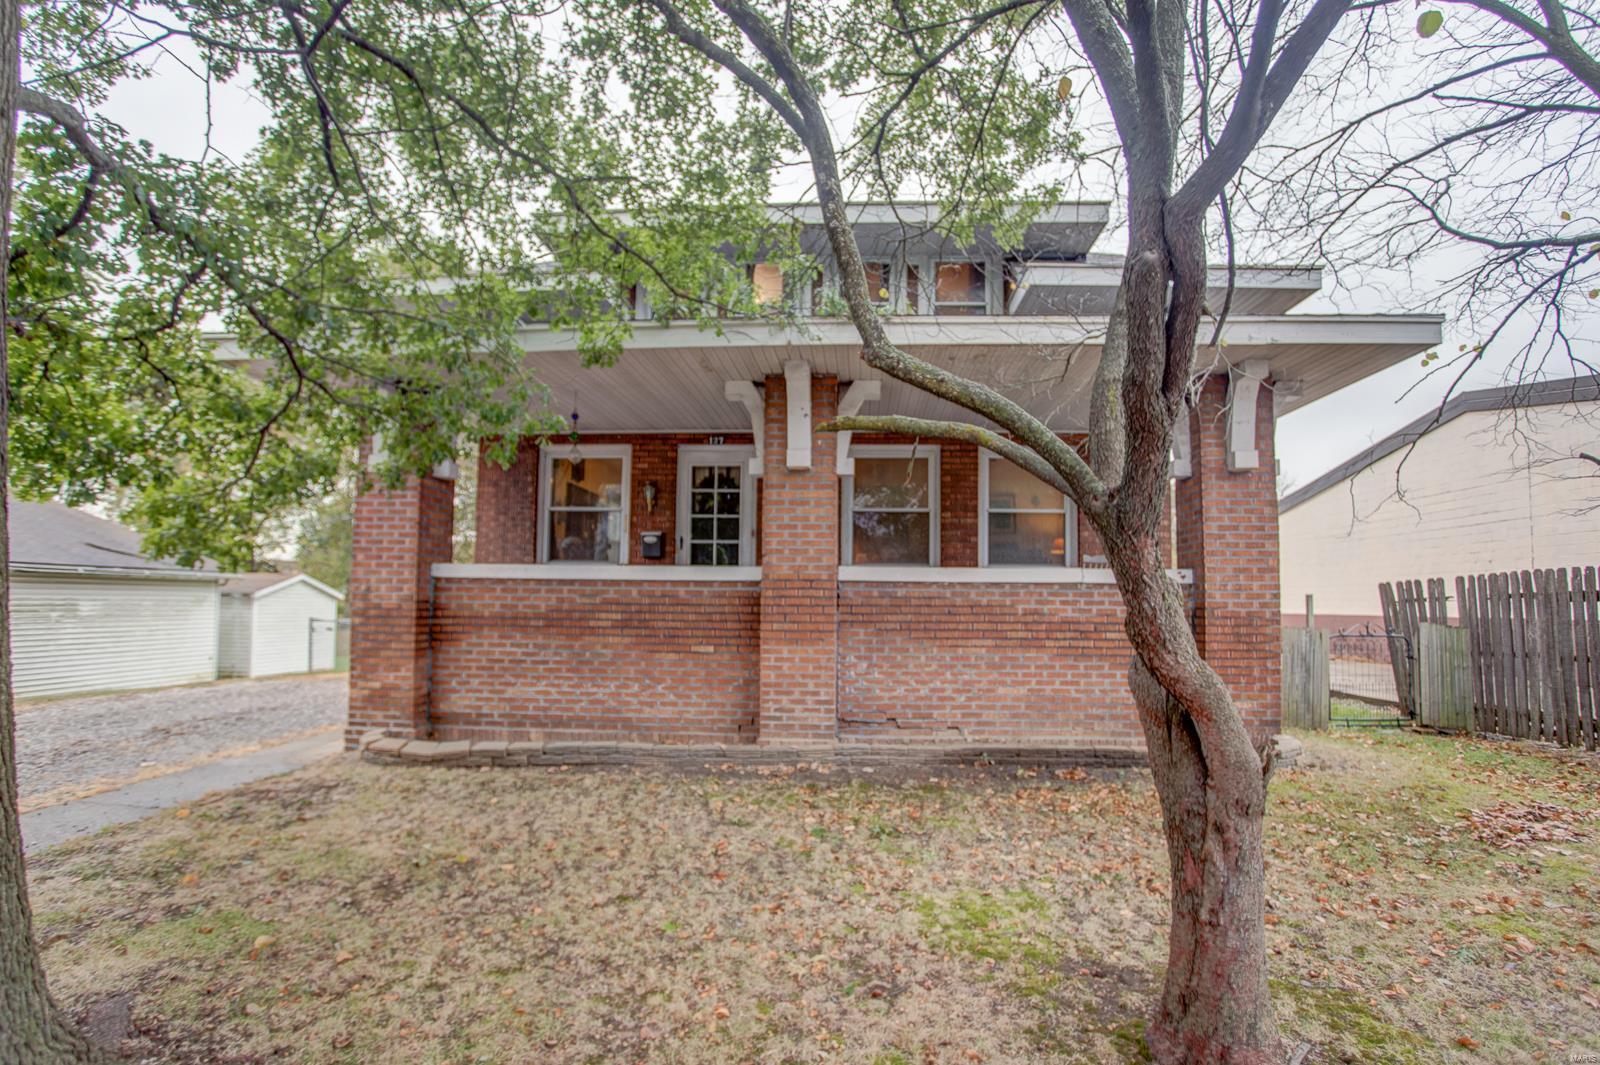 127 S Madison Property Photo - Staunton, IL real estate listing